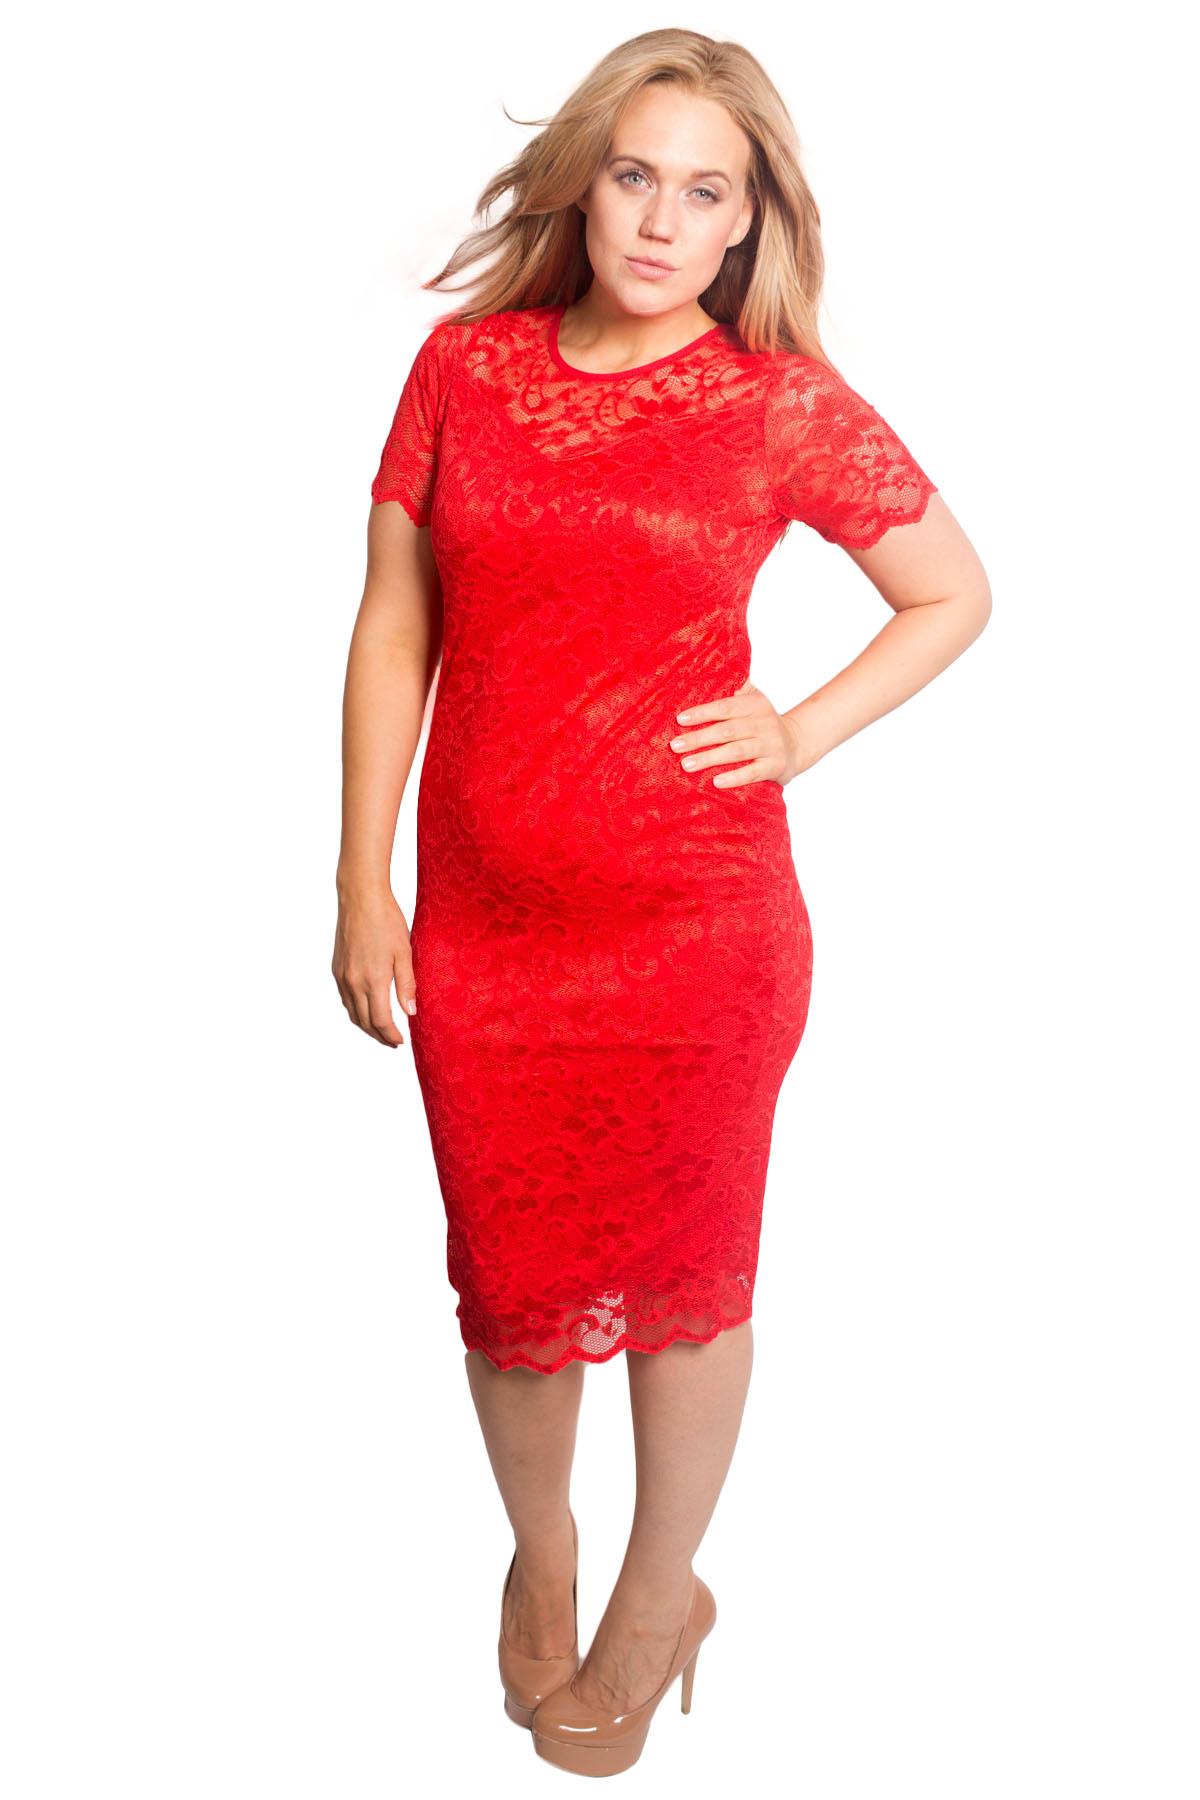 New Womens Dress Ladies Plus Size Bodycon Lace Sweetheart Midi Party Nouvelle